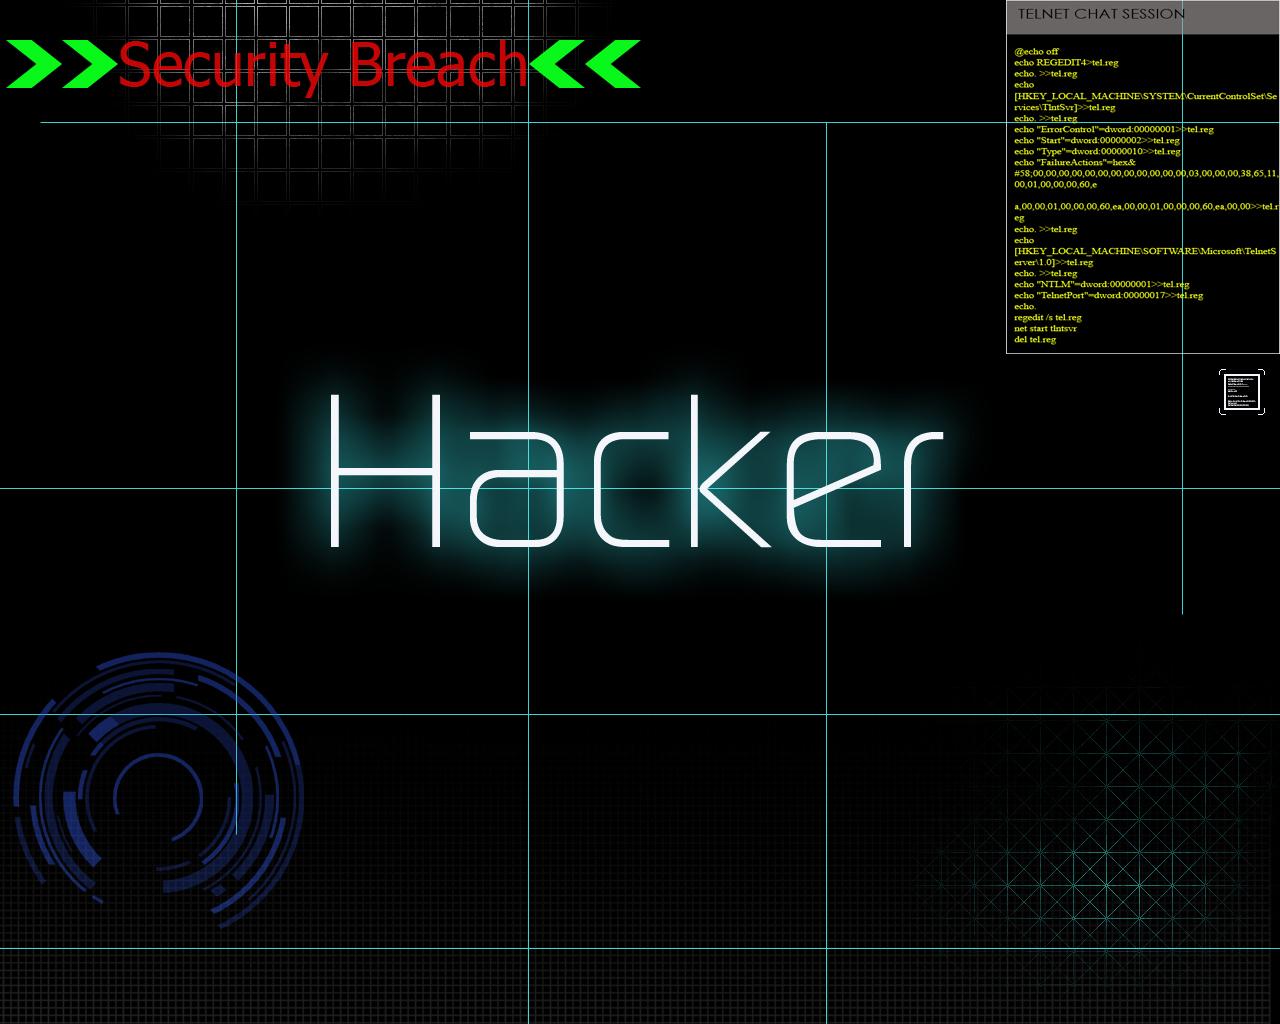 http://2.bp.blogspot.com/-lcBD9GLsCMs/TbtY_QvbLGI/AAAAAAAAASg/HEzIO2CxIIk/s1600/Hacker_Wallpaper_1280x1024_by_Ifeanyi.jpg